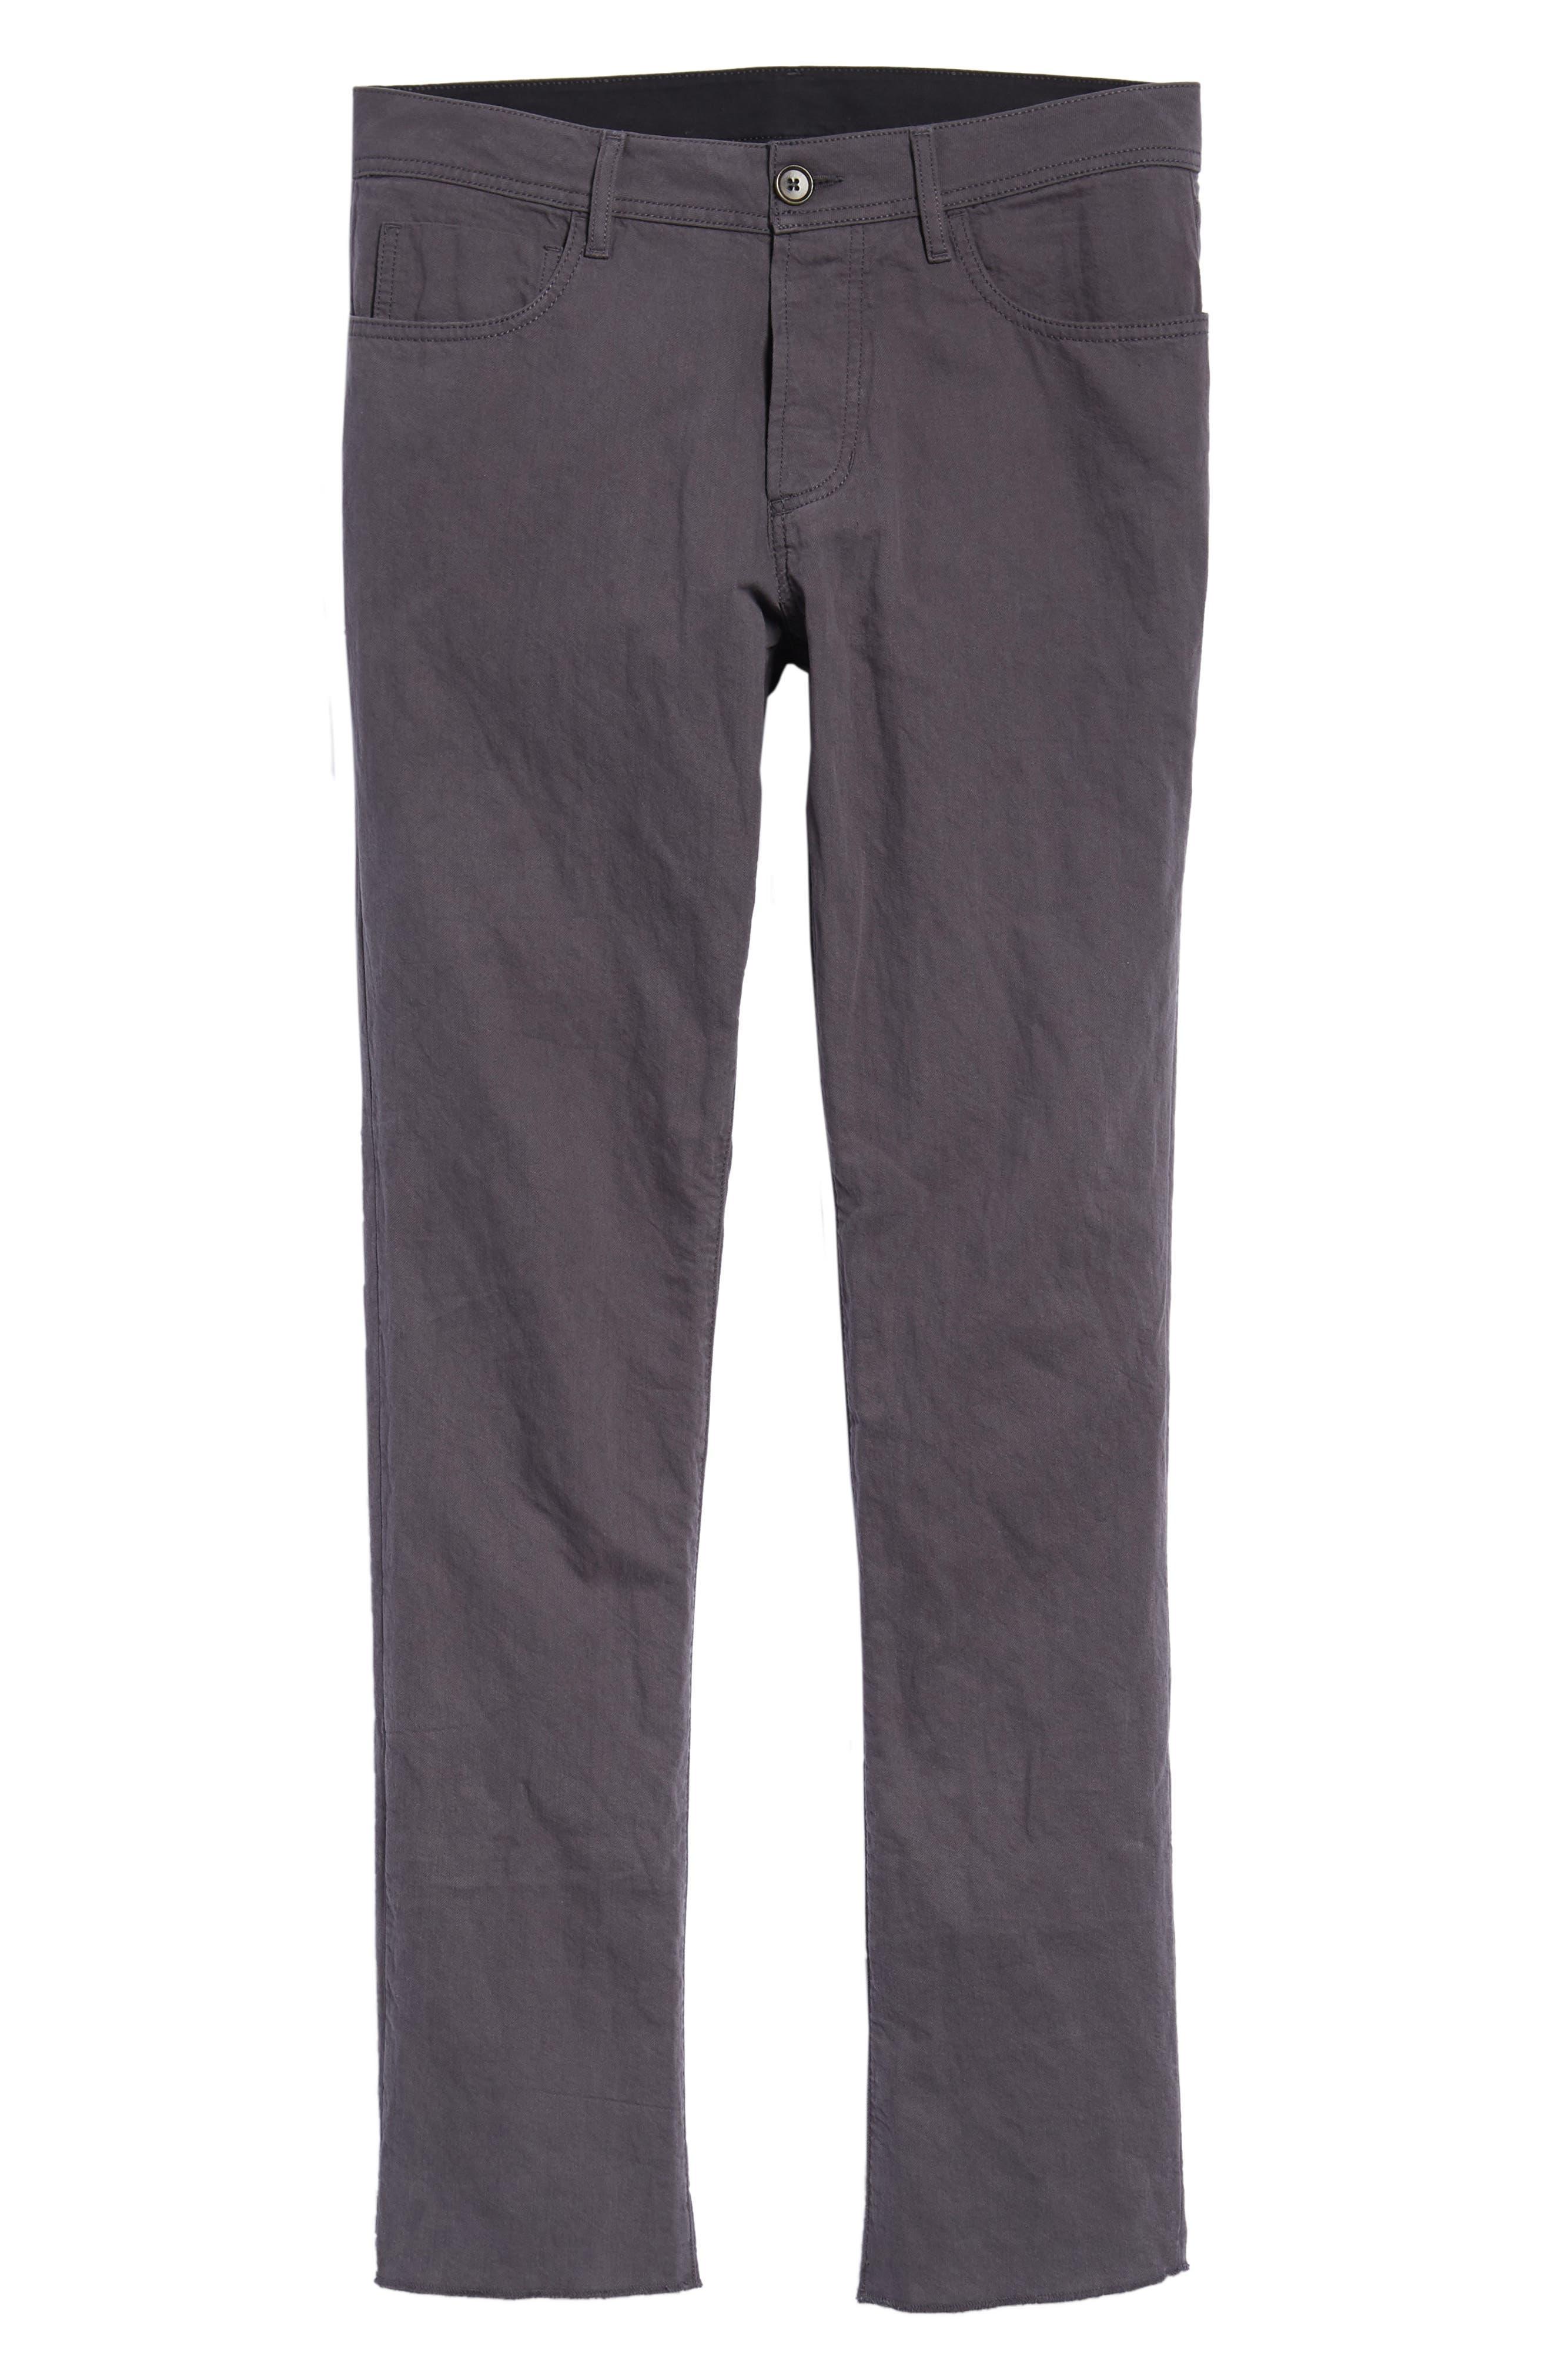 Slim Fit Twill Pants,                             Alternate thumbnail 6, color,                             037